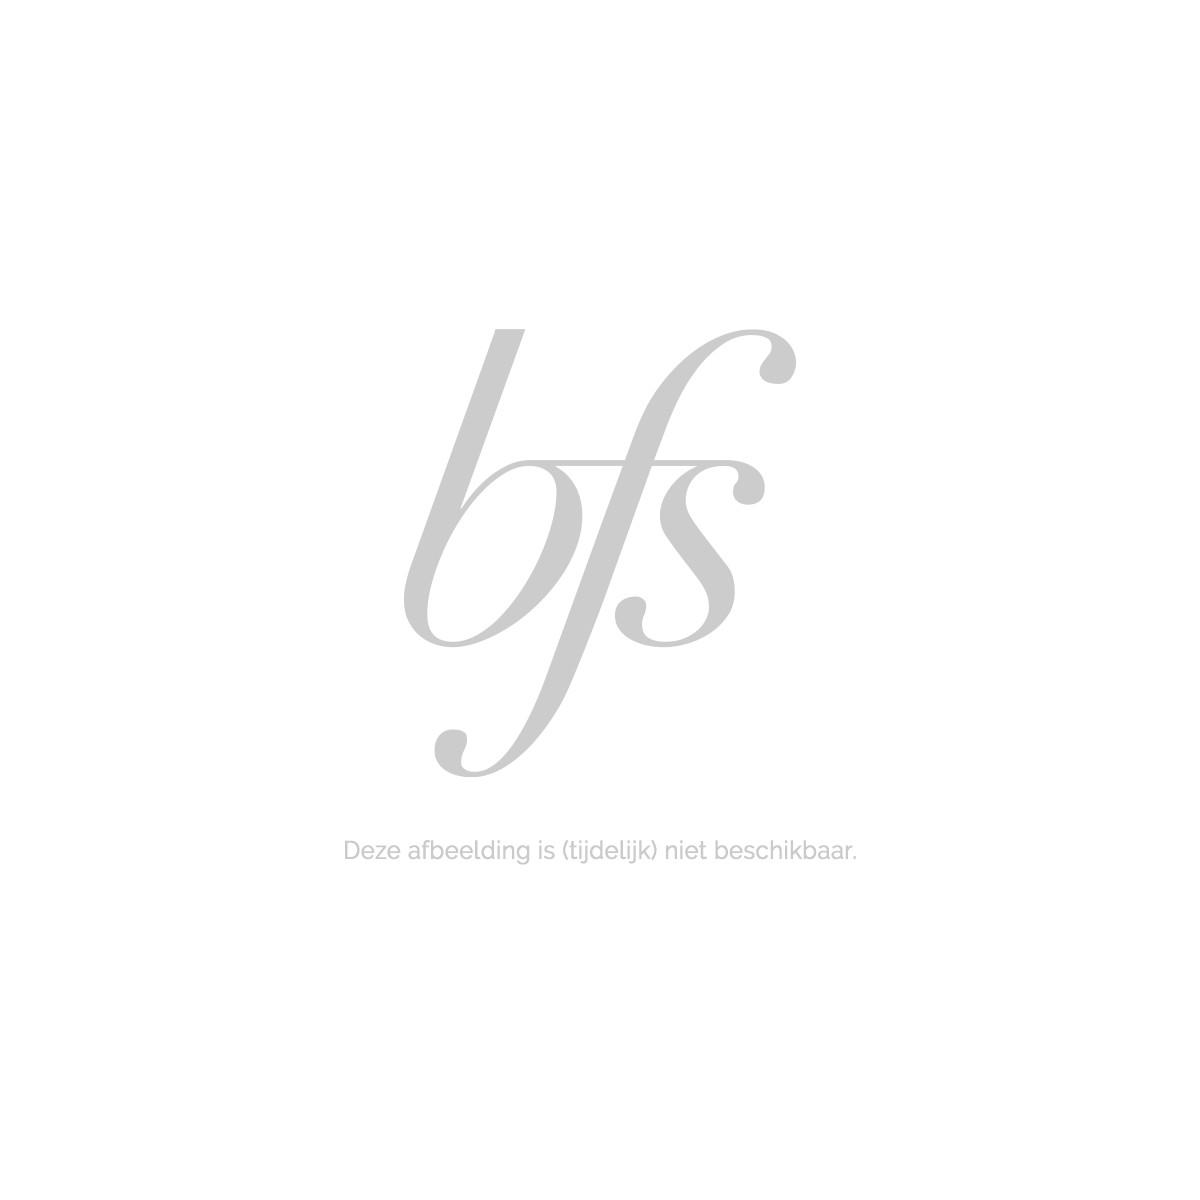 alessandro striplac starter kit french beautyfashionshop. Black Bedroom Furniture Sets. Home Design Ideas